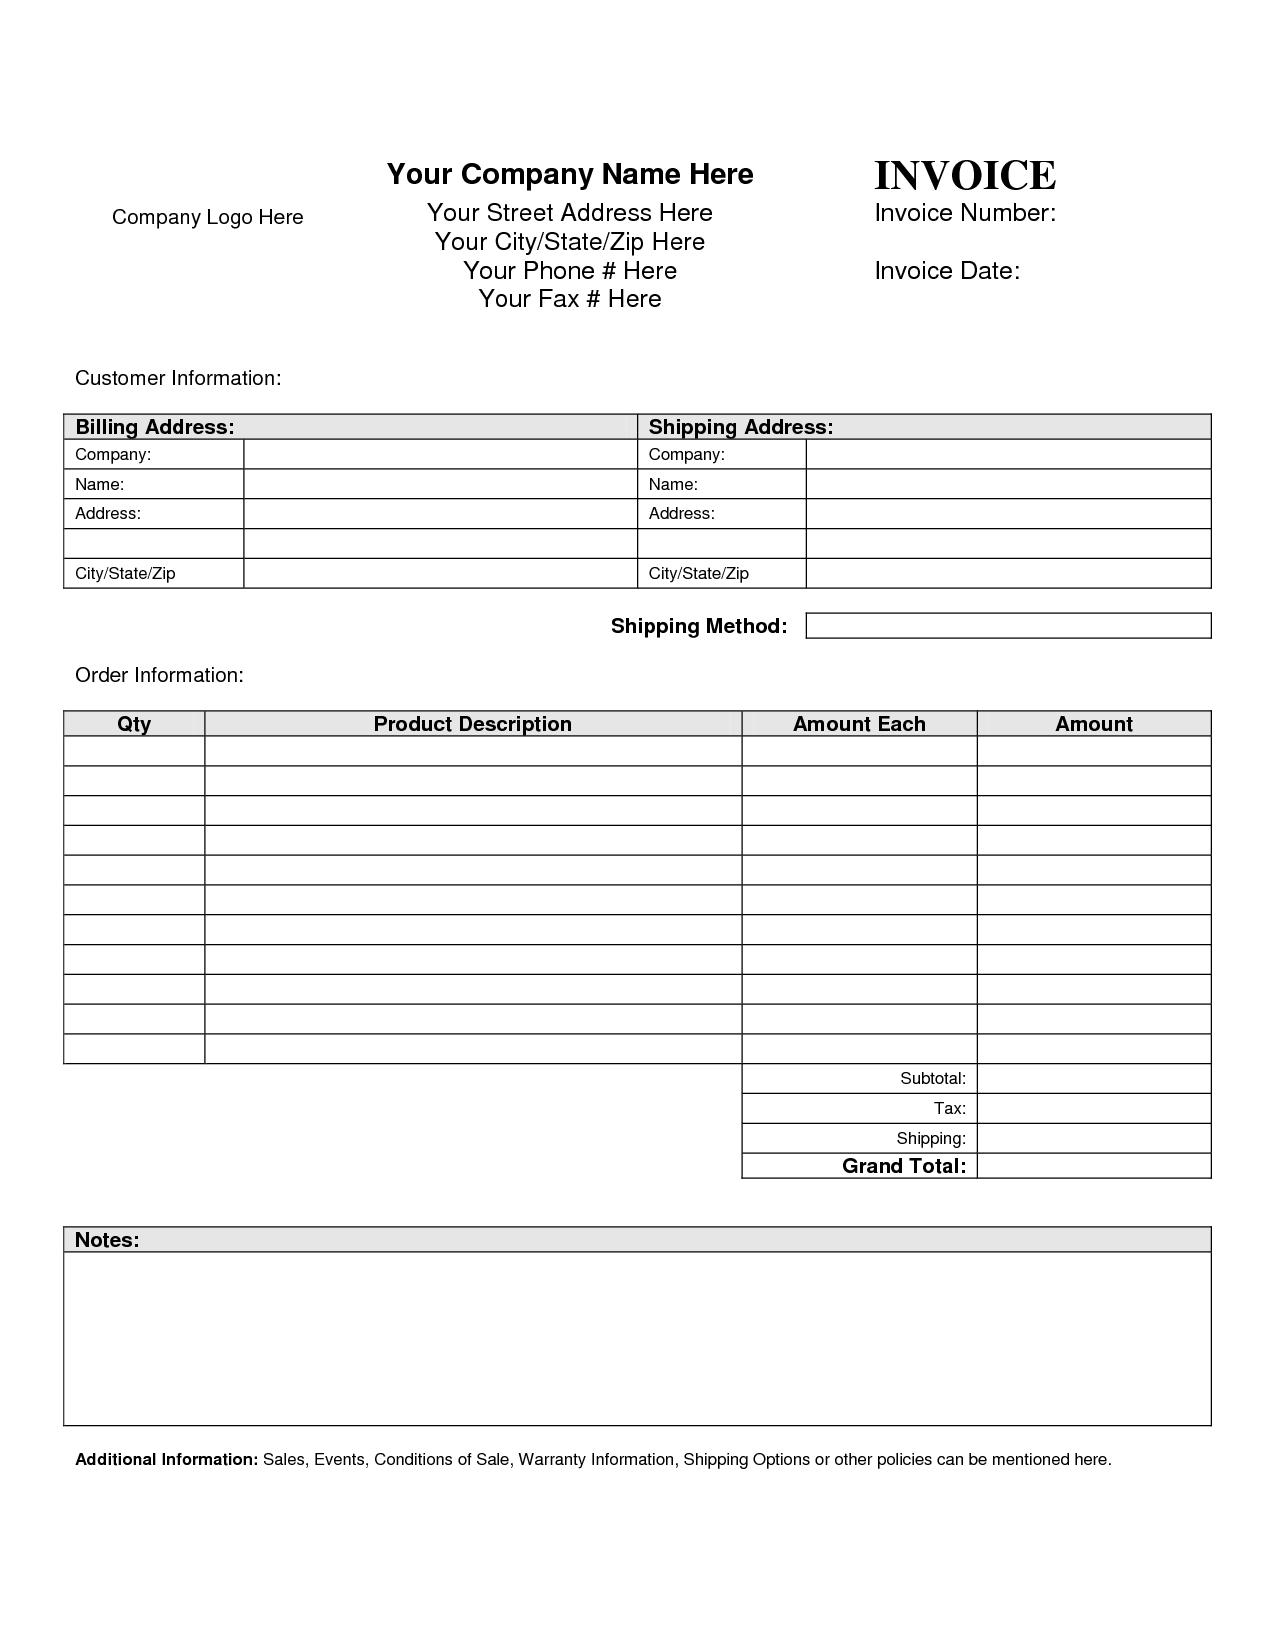 blank invoice template blank invoice sample invoice templates